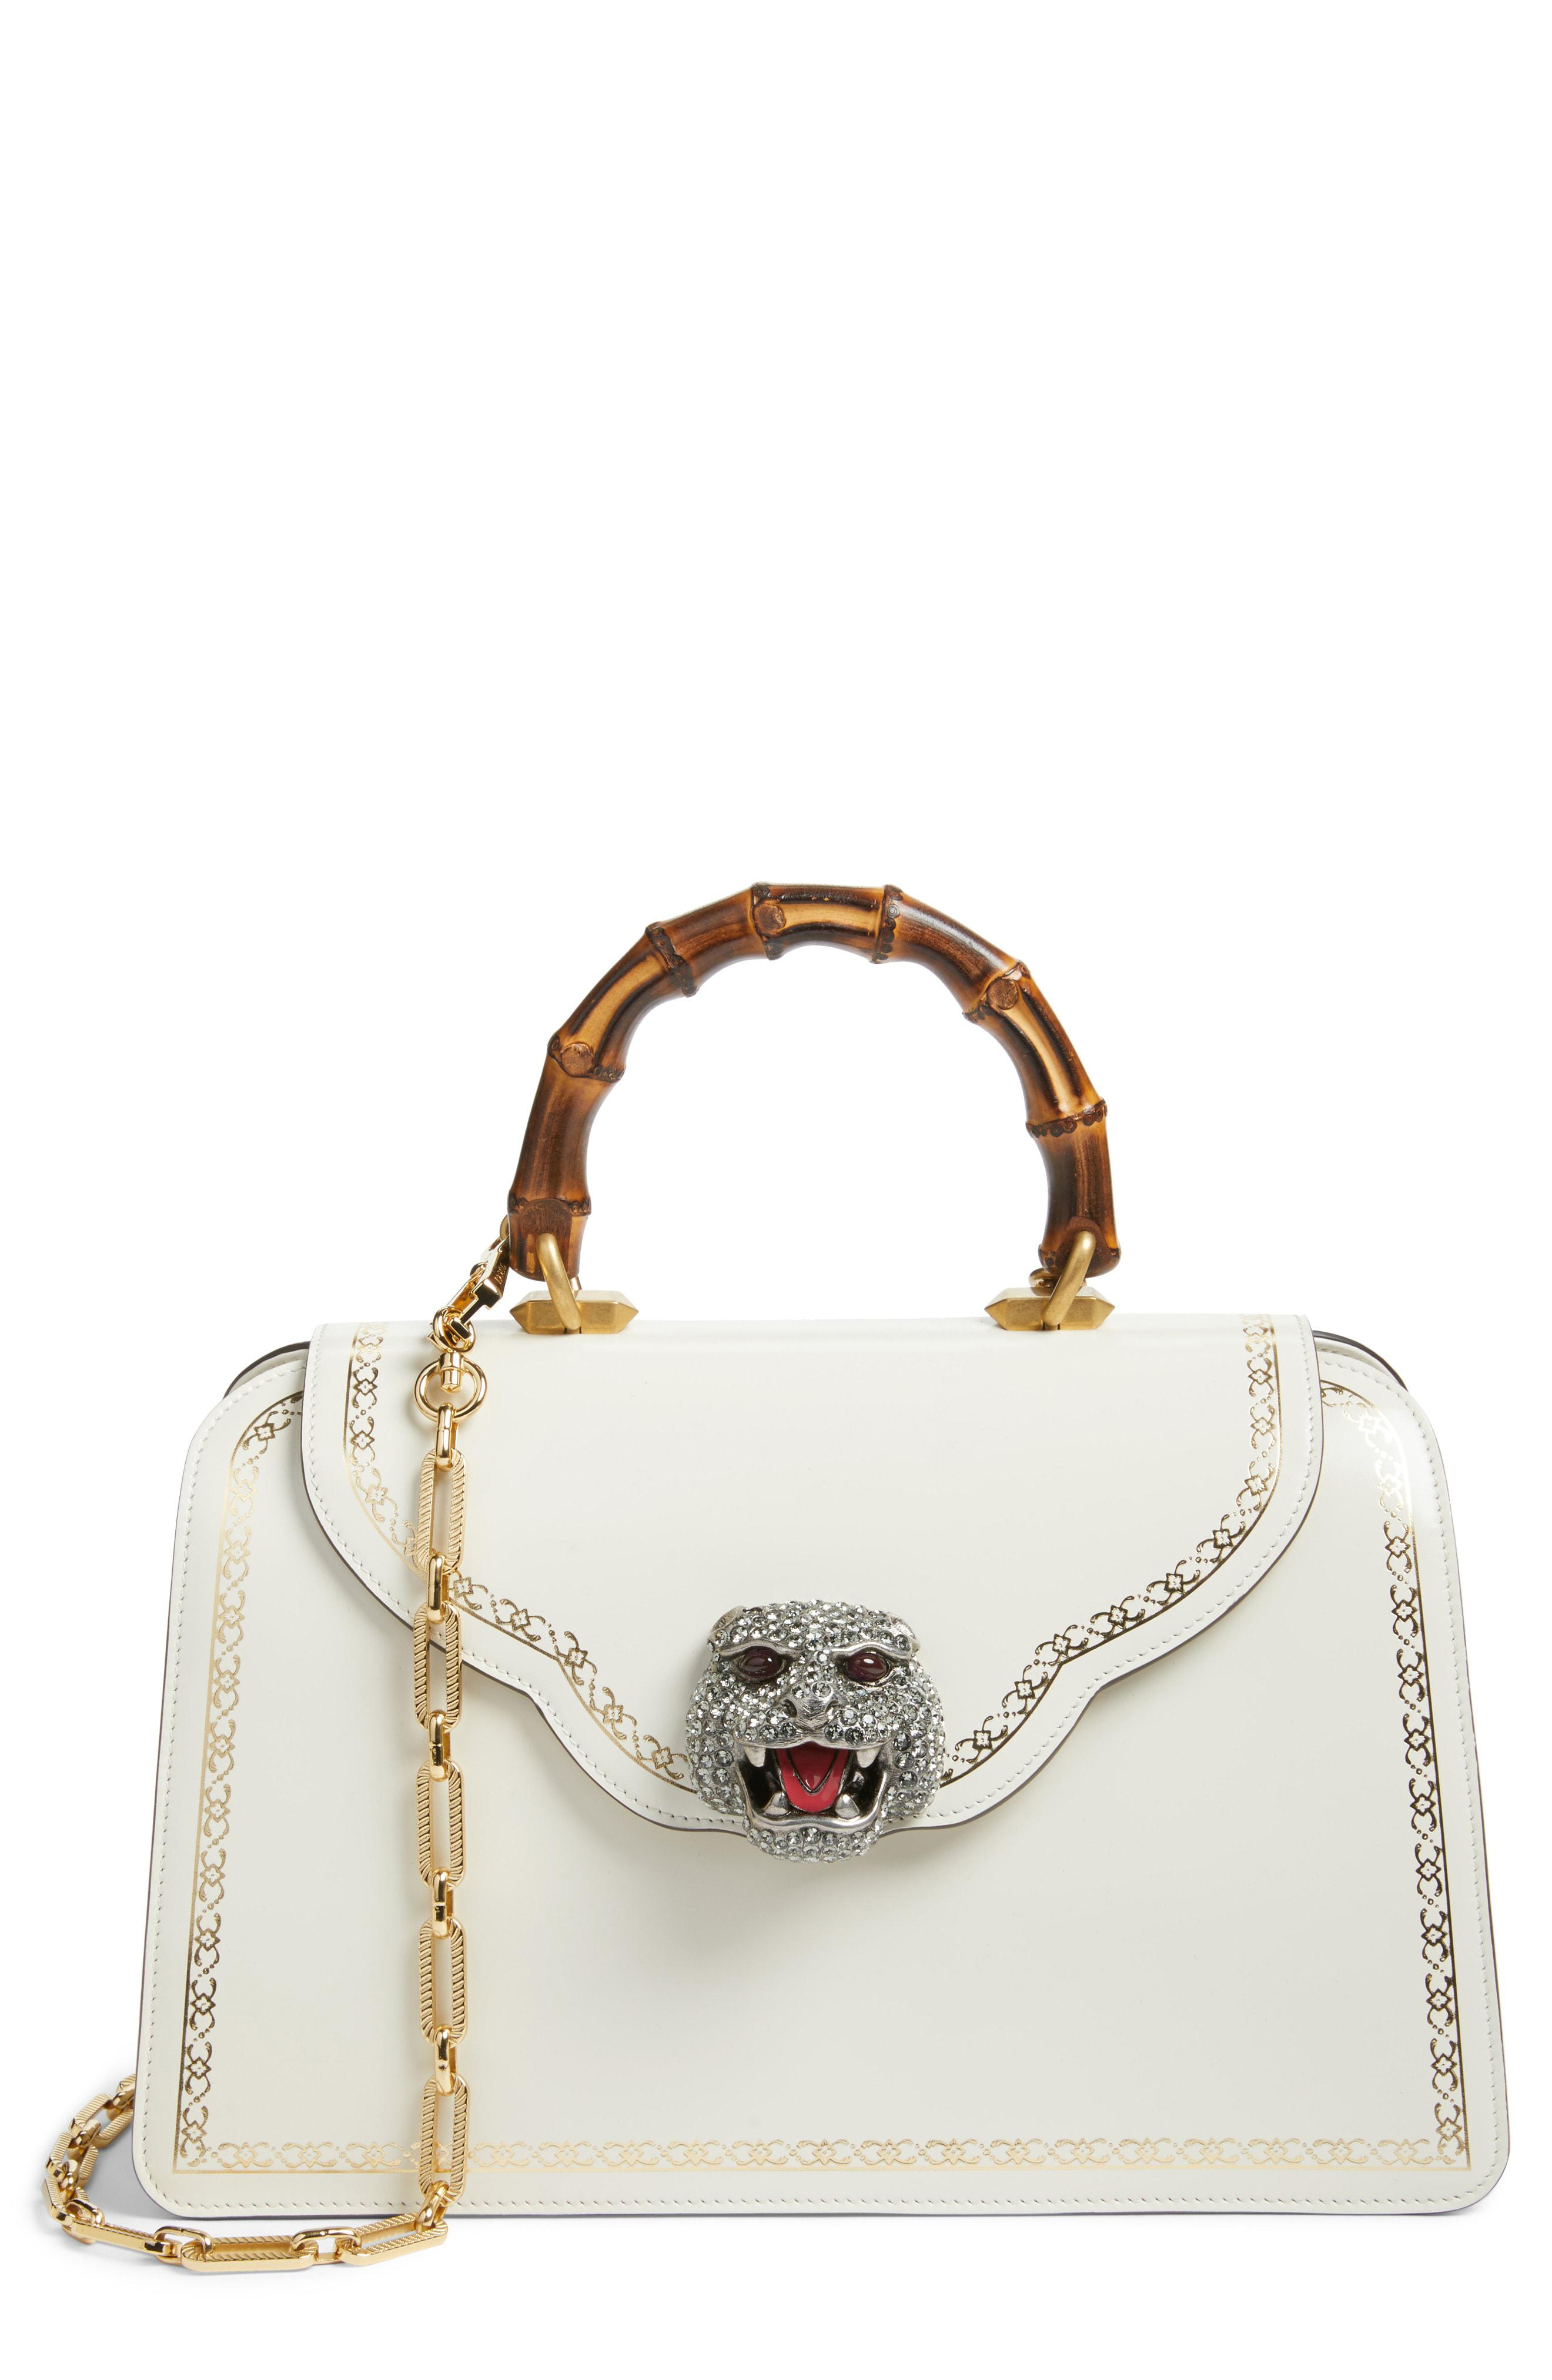 290948833734 Lyst - Gucci Gatto Medium Top Handle Bag in White